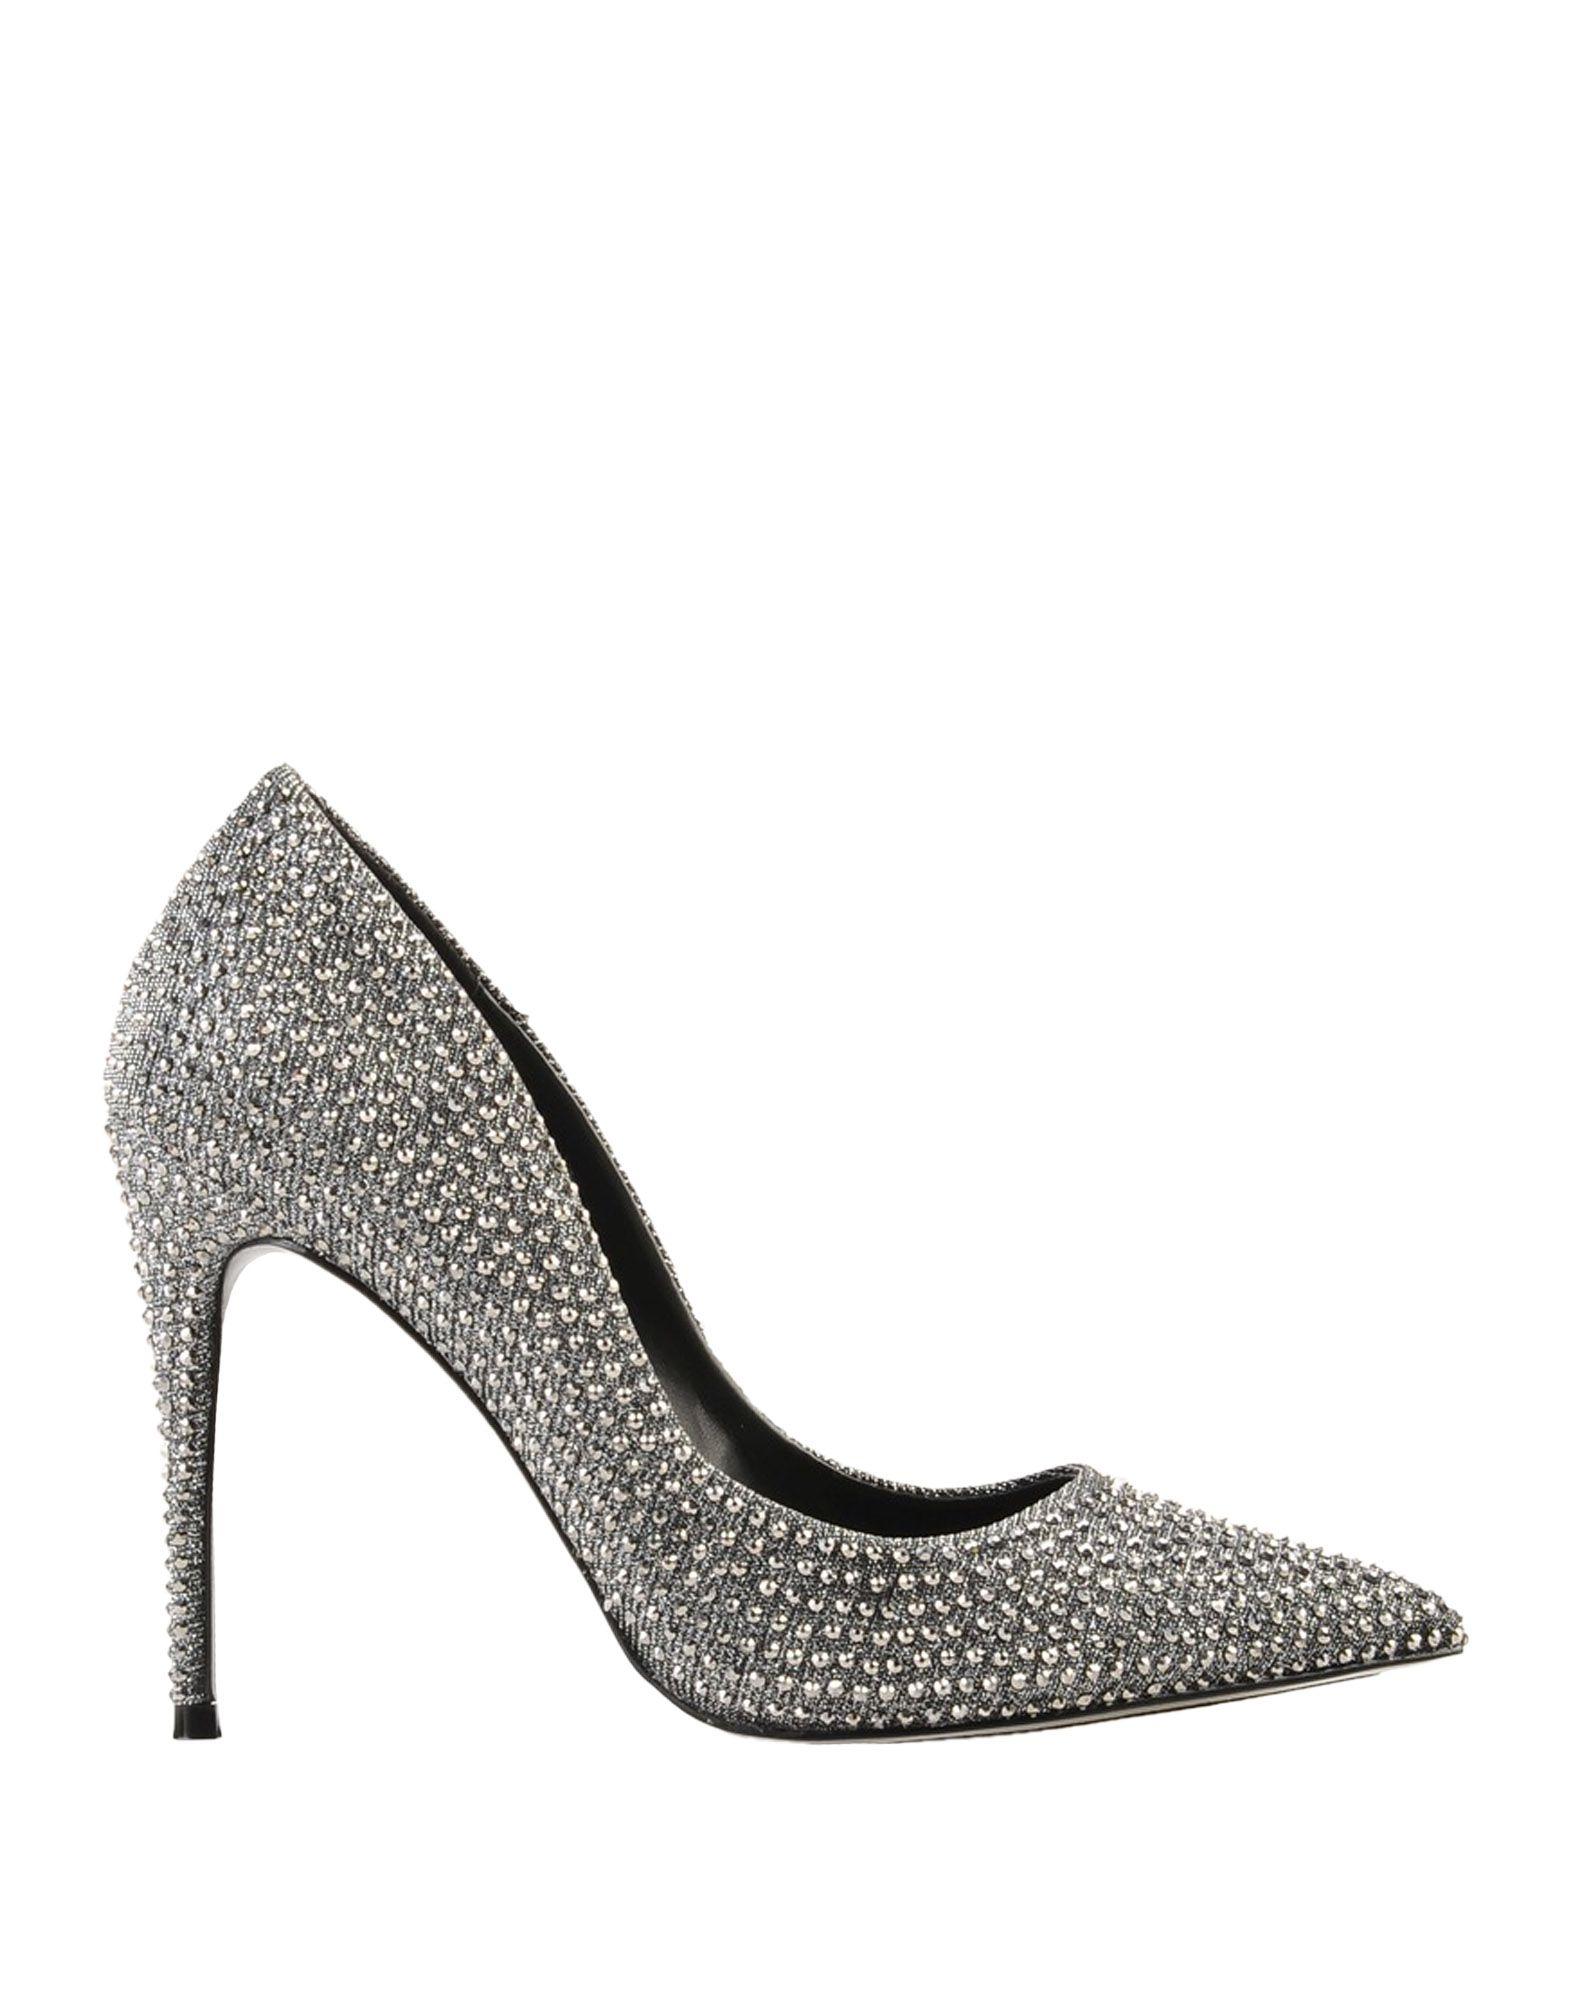 0d85751d7e525 Zapato De Salón Steve Madden Daisie-R - Mujer - Salones Steve Madden en  YOOX - 11585349PP